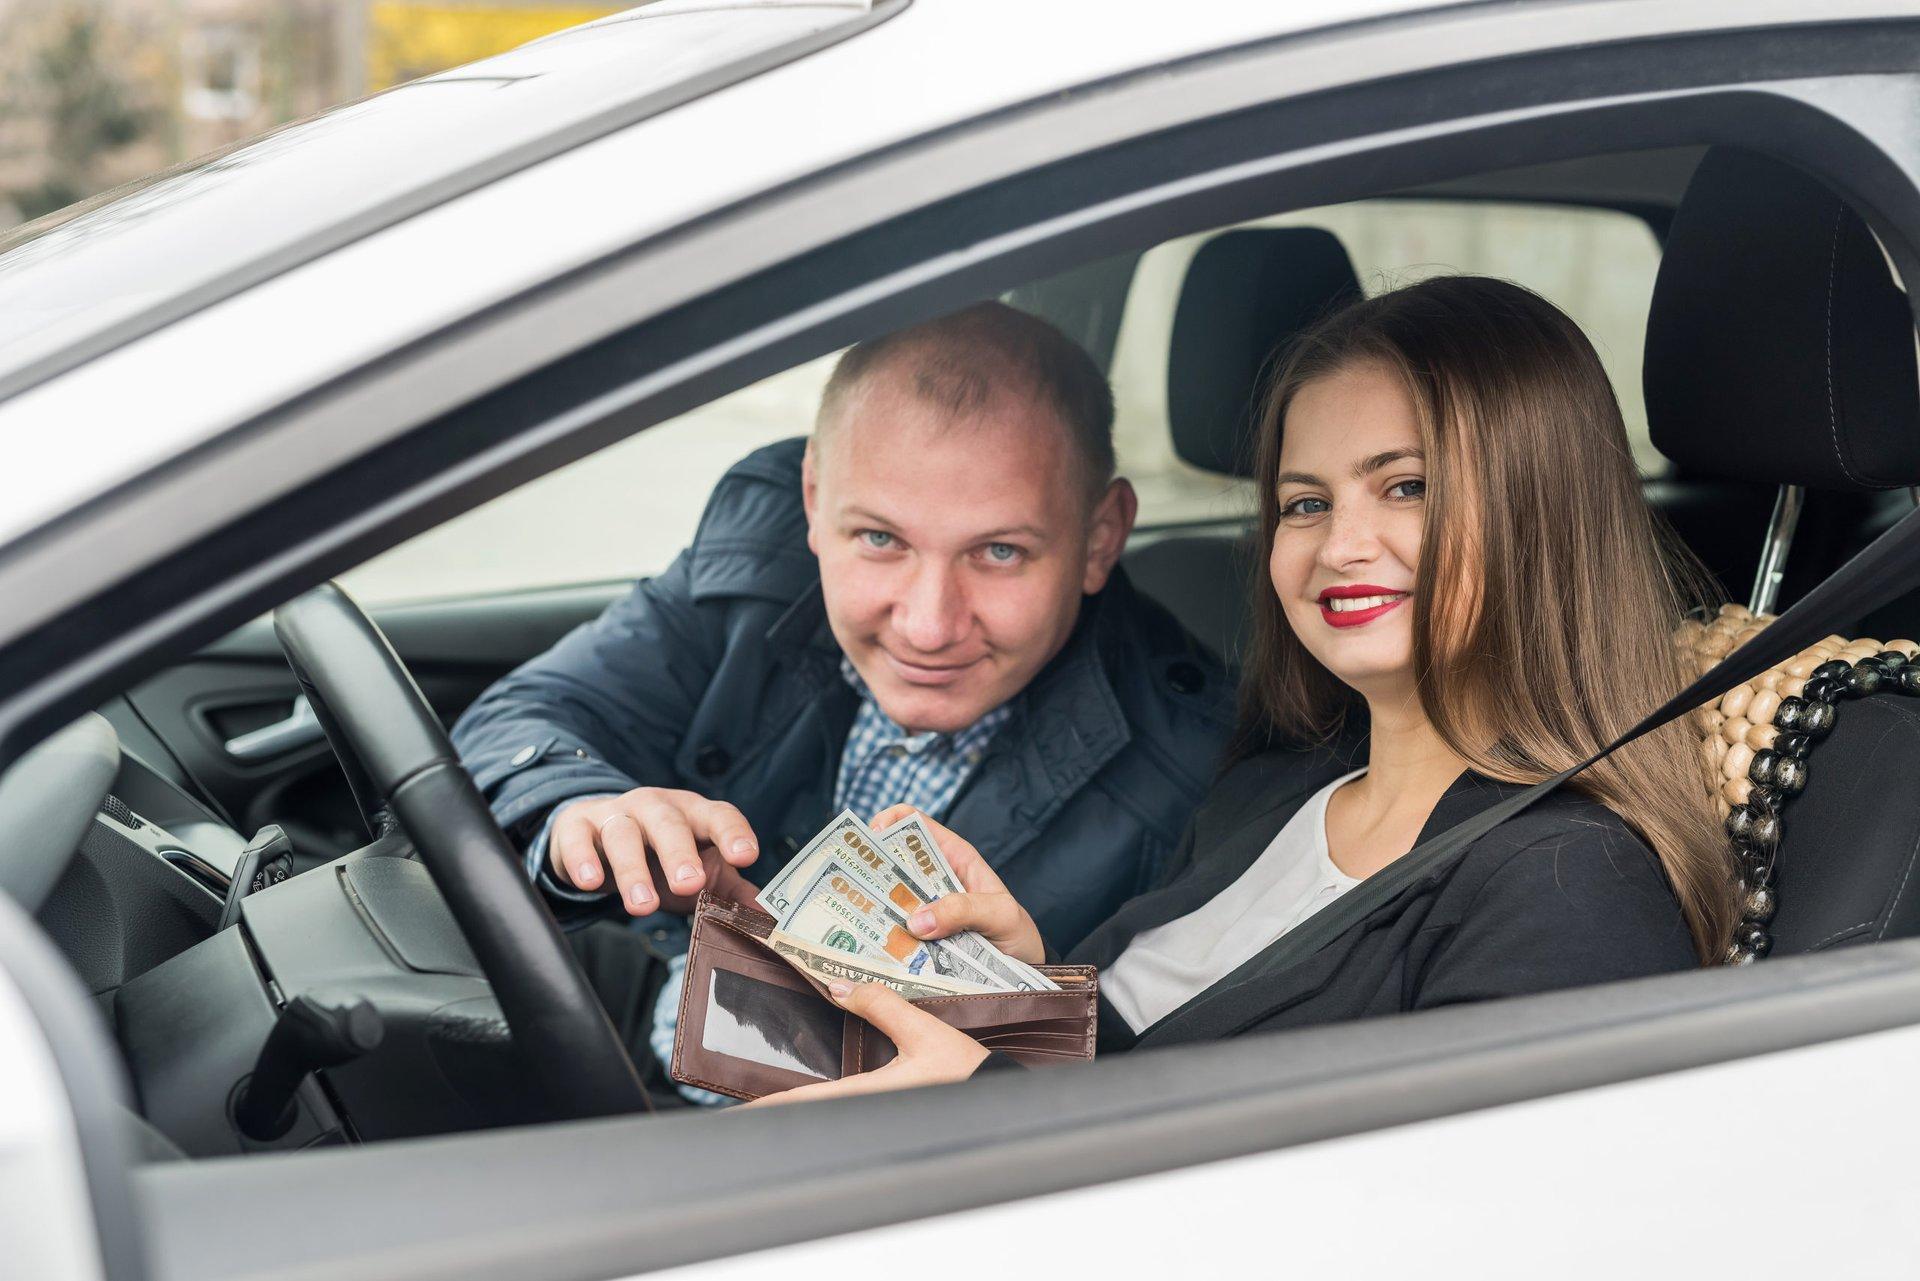 Driver saving money on used car